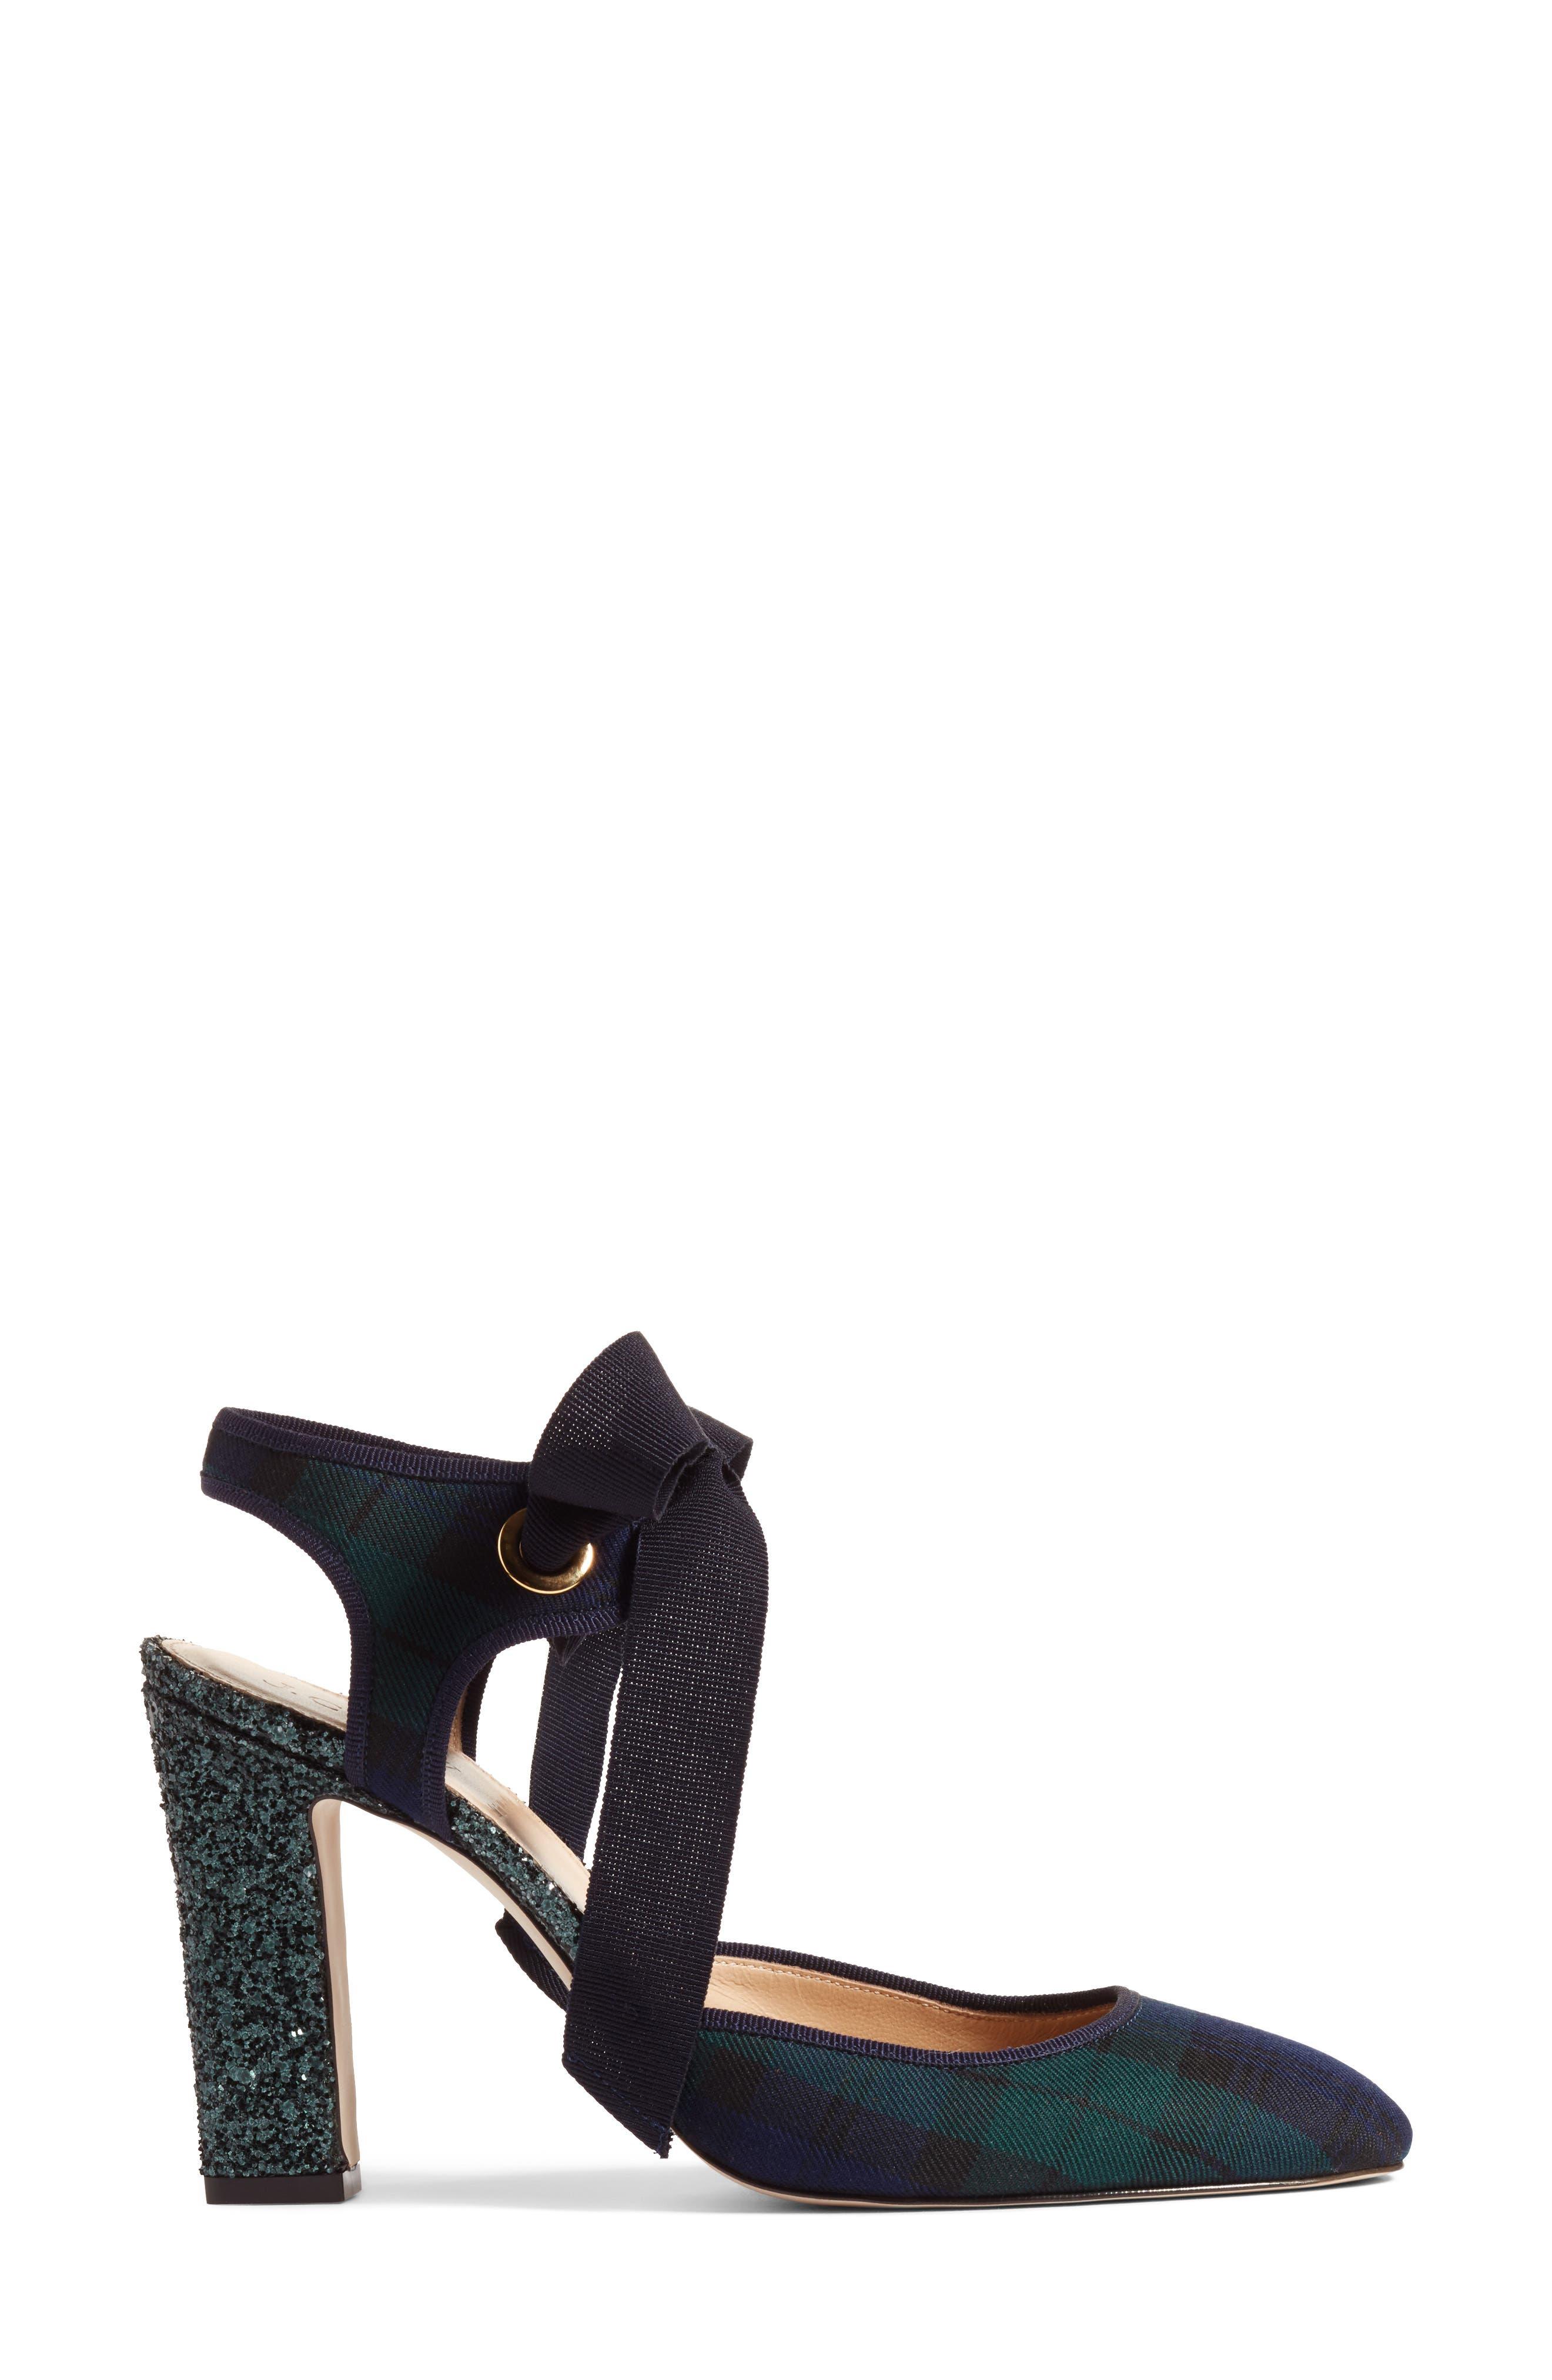 Blackwatch Bow Pump,                             Alternate thumbnail 3, color,                             Green/ Black Leather